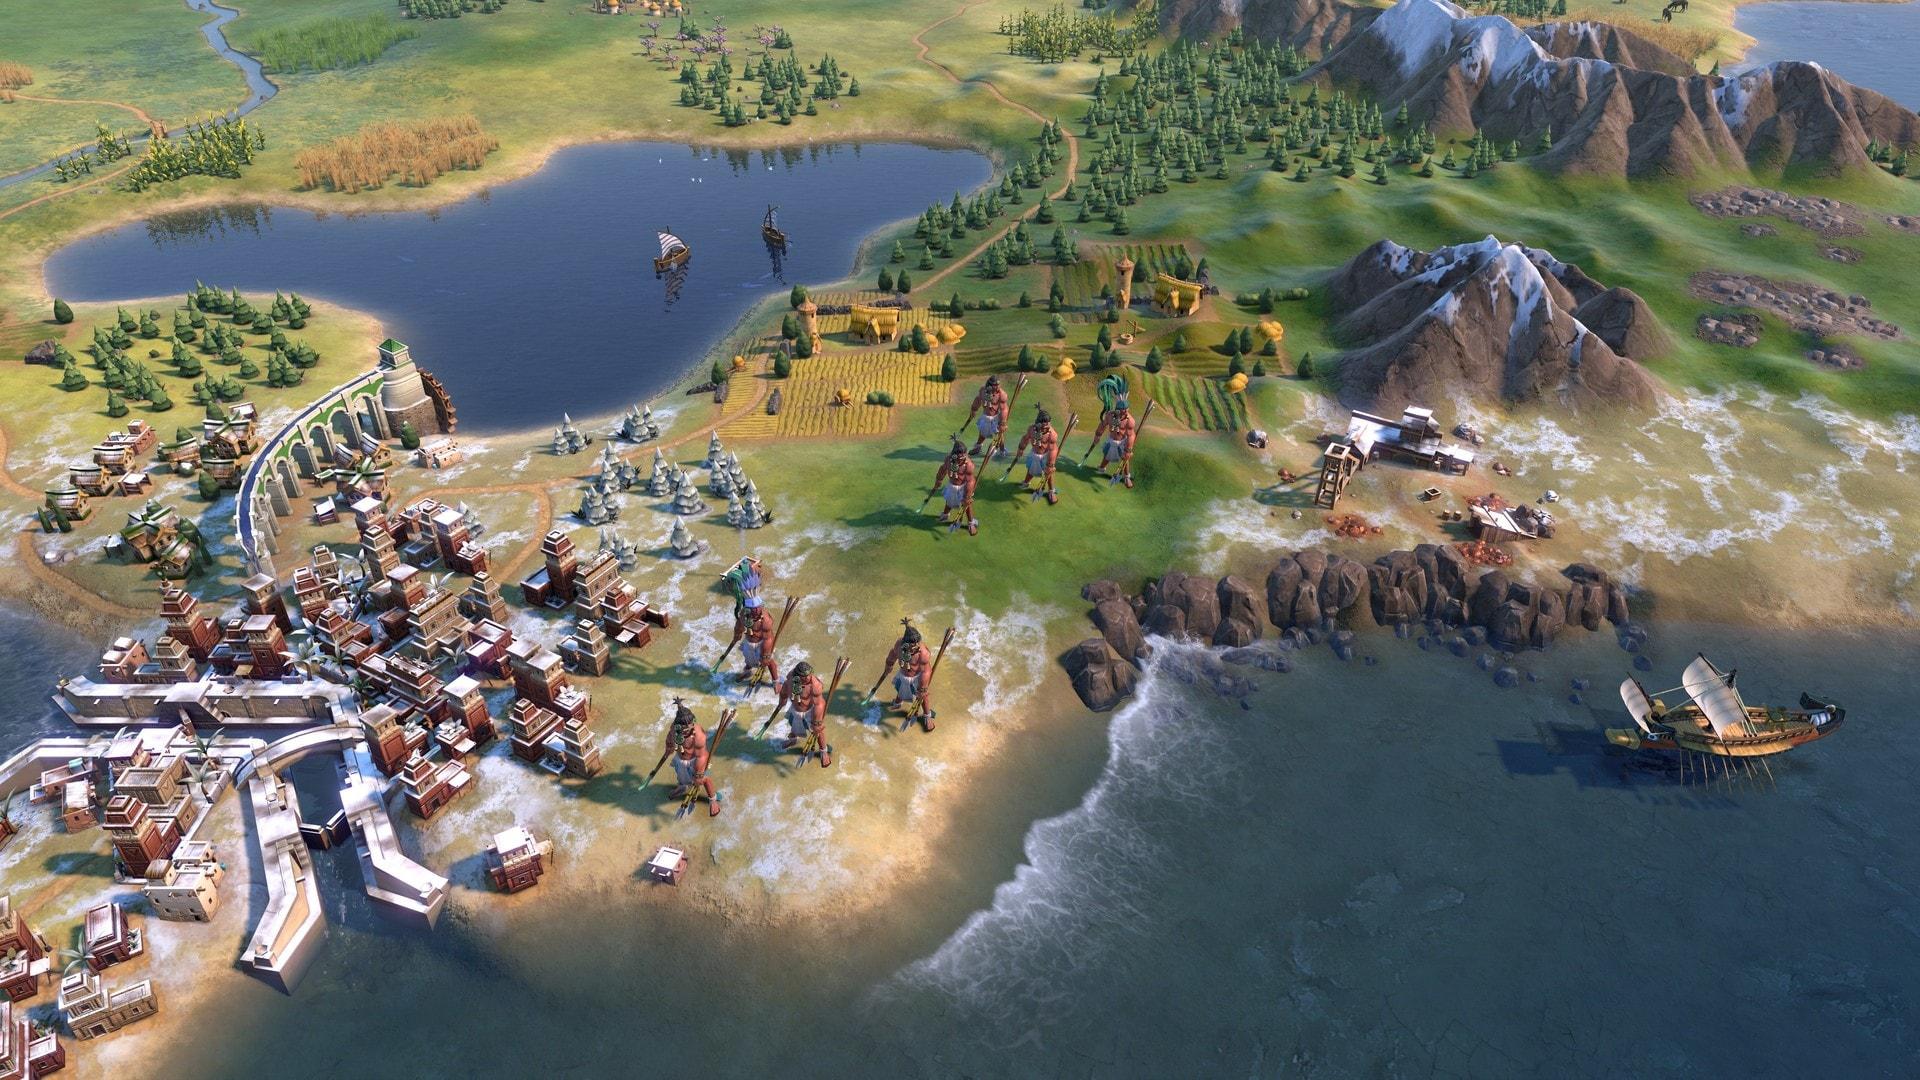 Sid Meier's Civilization VI - New Frontier Pass (PC) - Steam Key - GLOBAL - 4